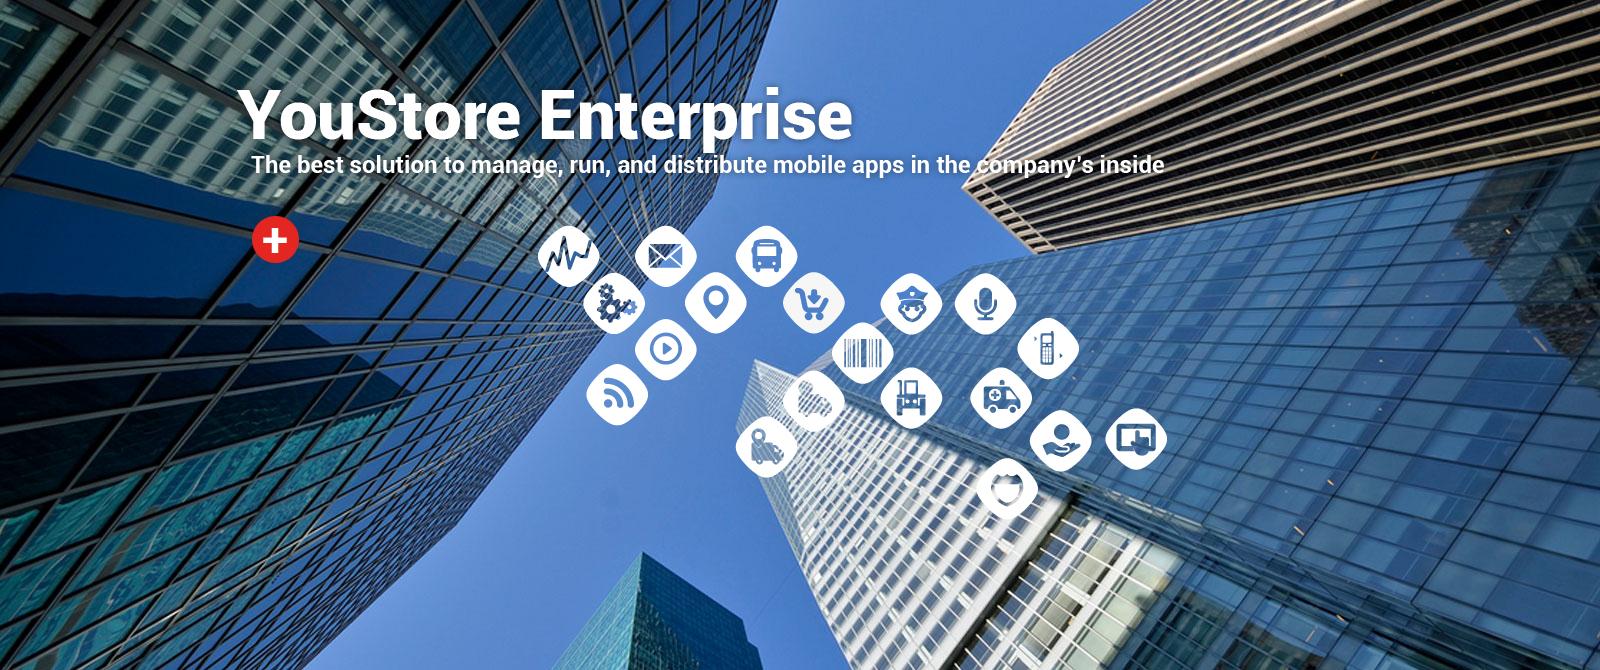 youstore_enterprise